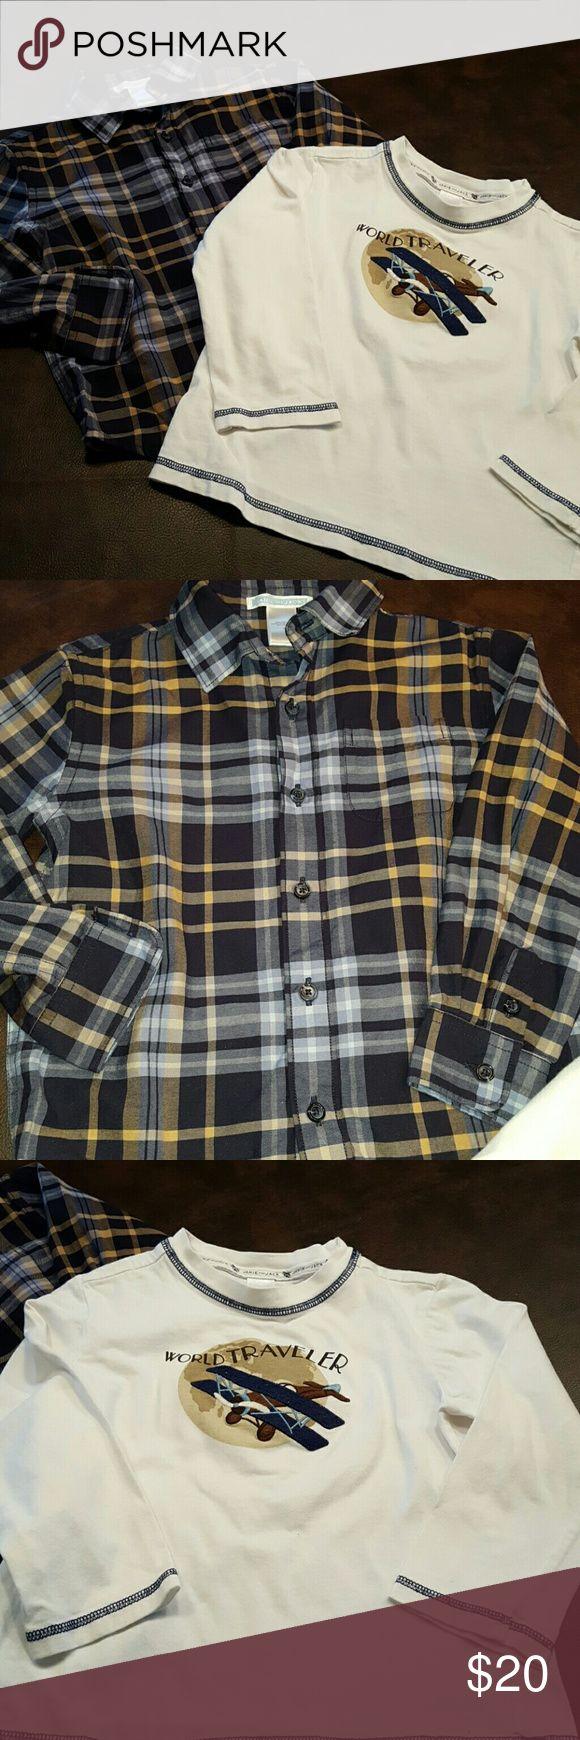 BOYS ❄Janie & Jack shirt bundle sz 4 EUC Such great quality from Janie & Jack. Button down plaid and long sleeve tee. Sz 4. EUC. Smoke free, pet free home. Janie and Jack Shirts & Tops